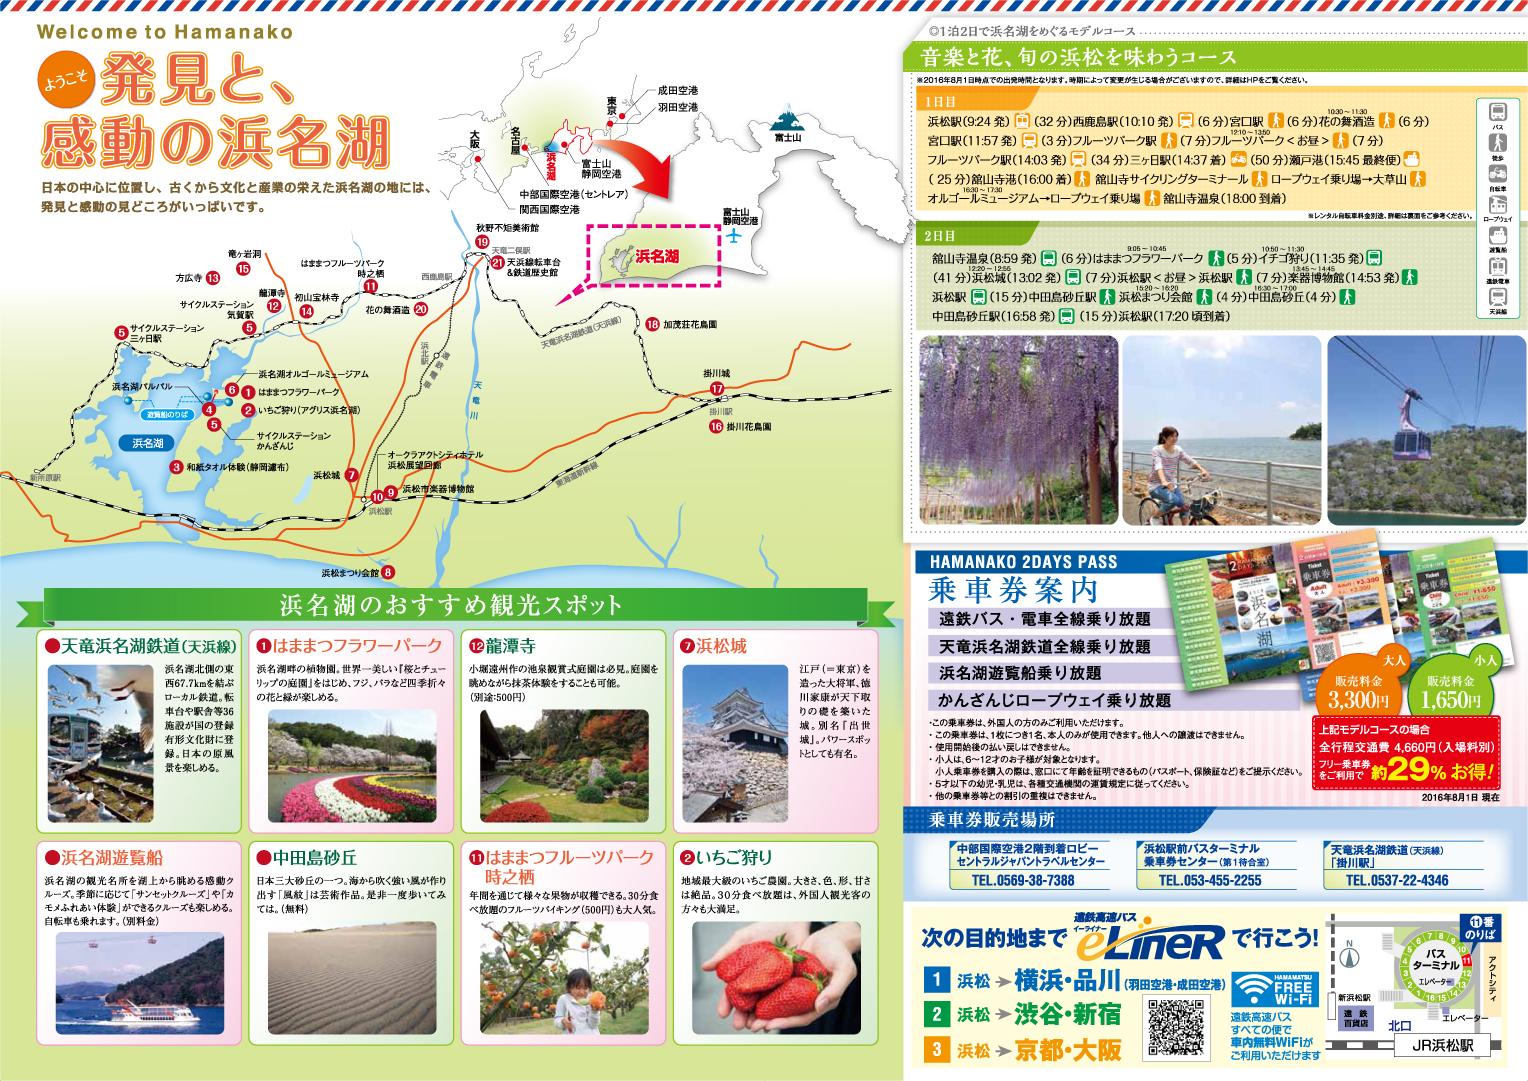 http://www.inhamamatsu.com/japanese/recommend/hnkrp2_ura.jpg